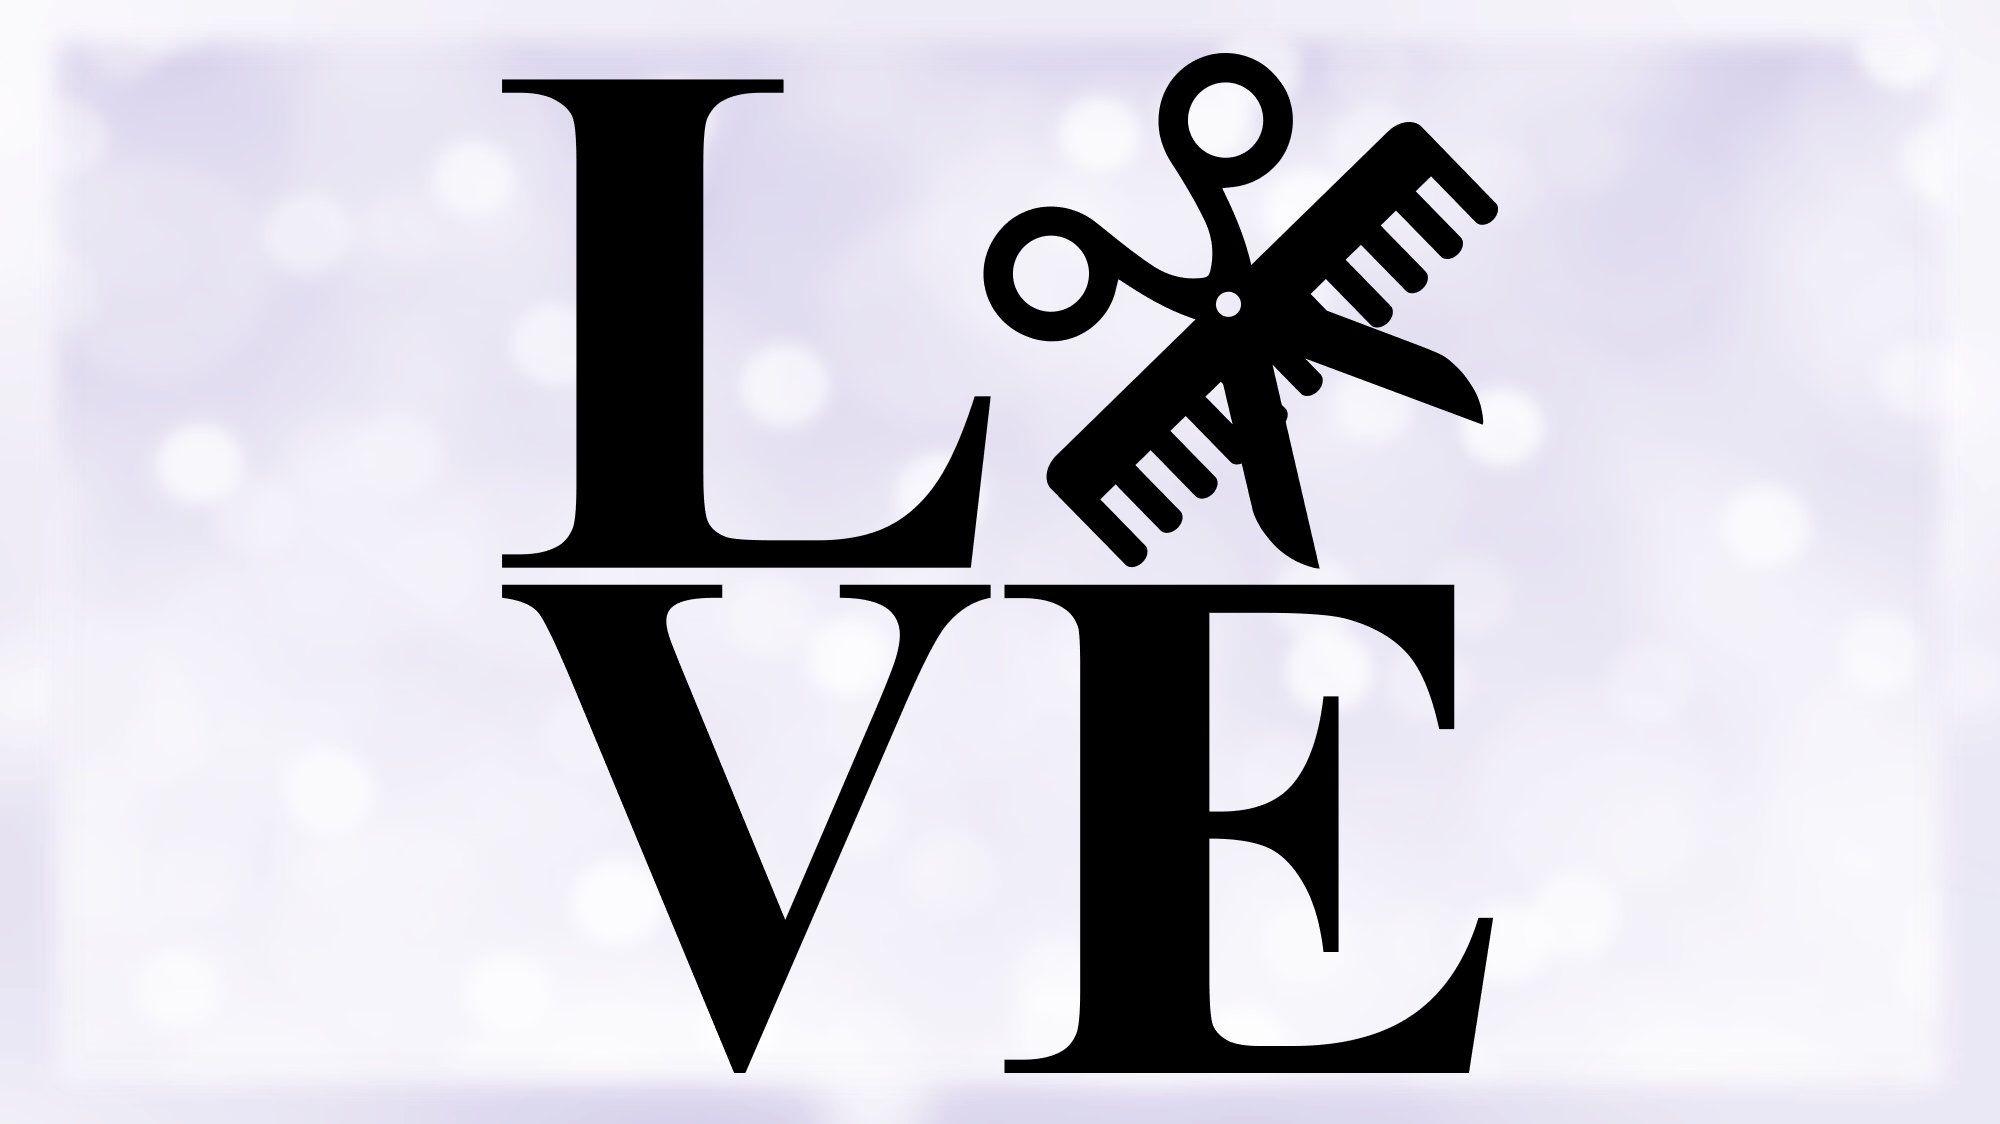 Download Hair Stylist / Beauty Salon Clipart: Word Love in | Etsy ...